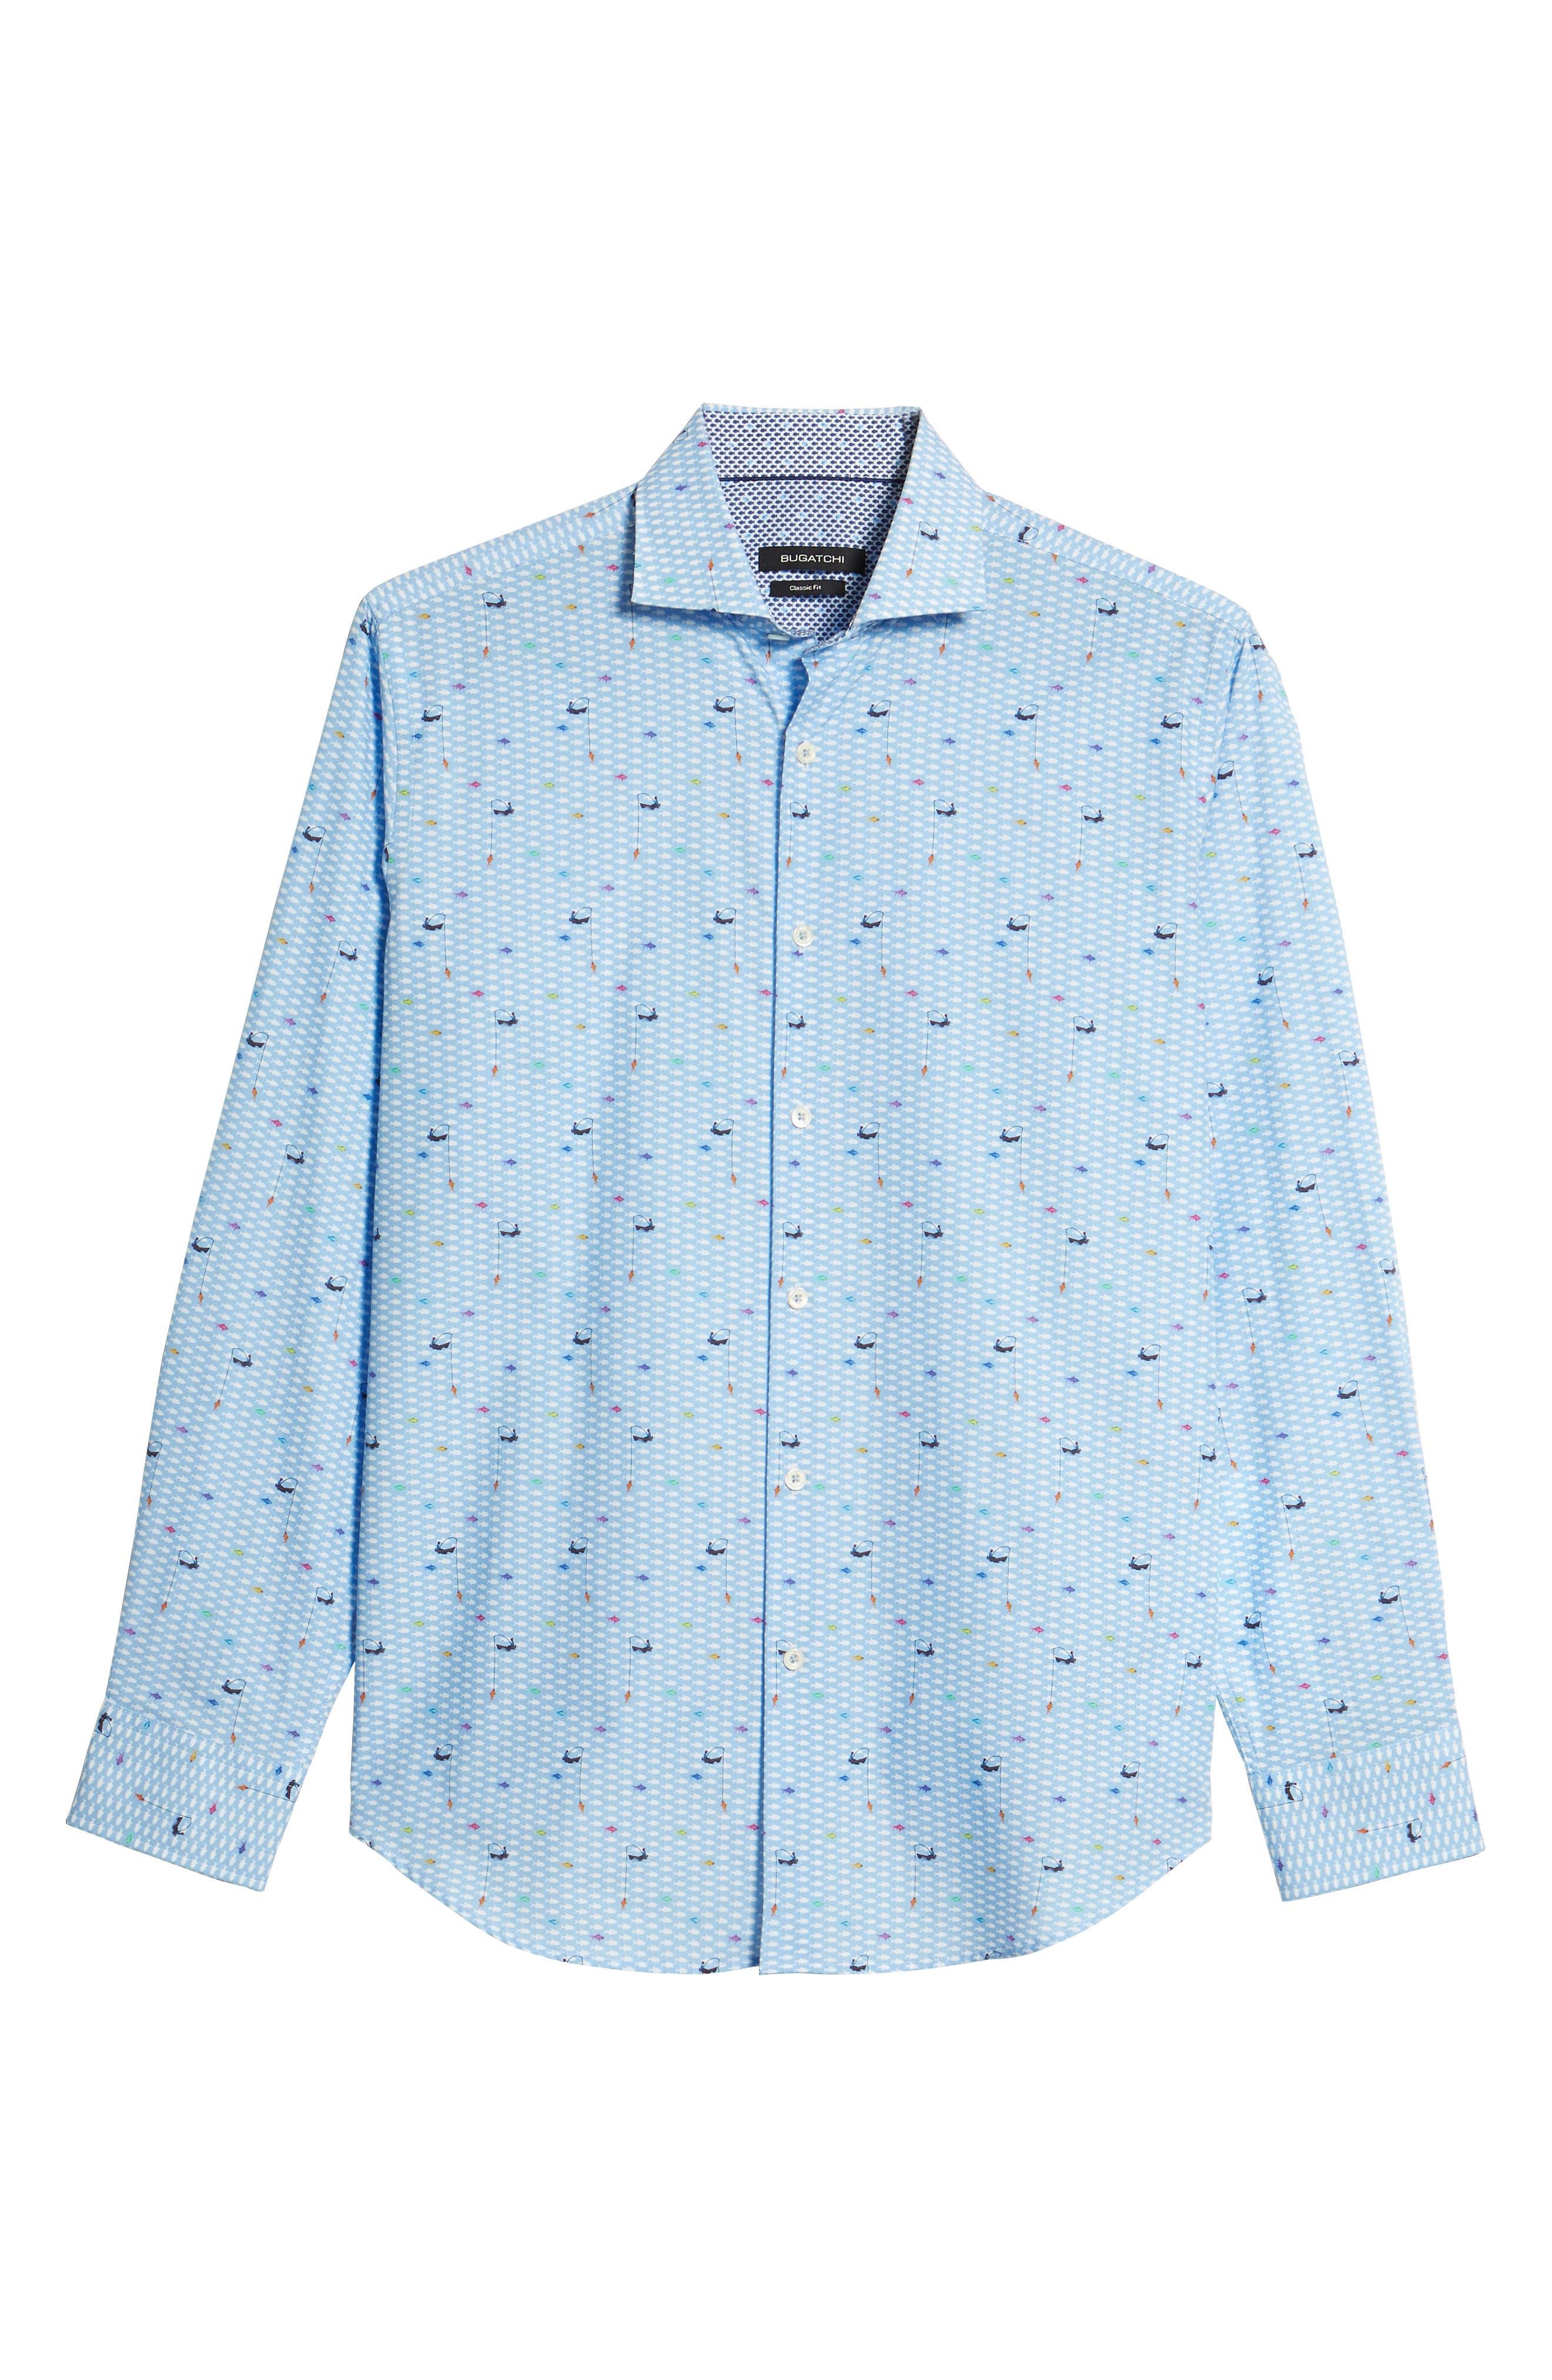 Classic Fit Fisherman Print Sport Shirt,                             Alternate thumbnail 6, color,                             Air Blue